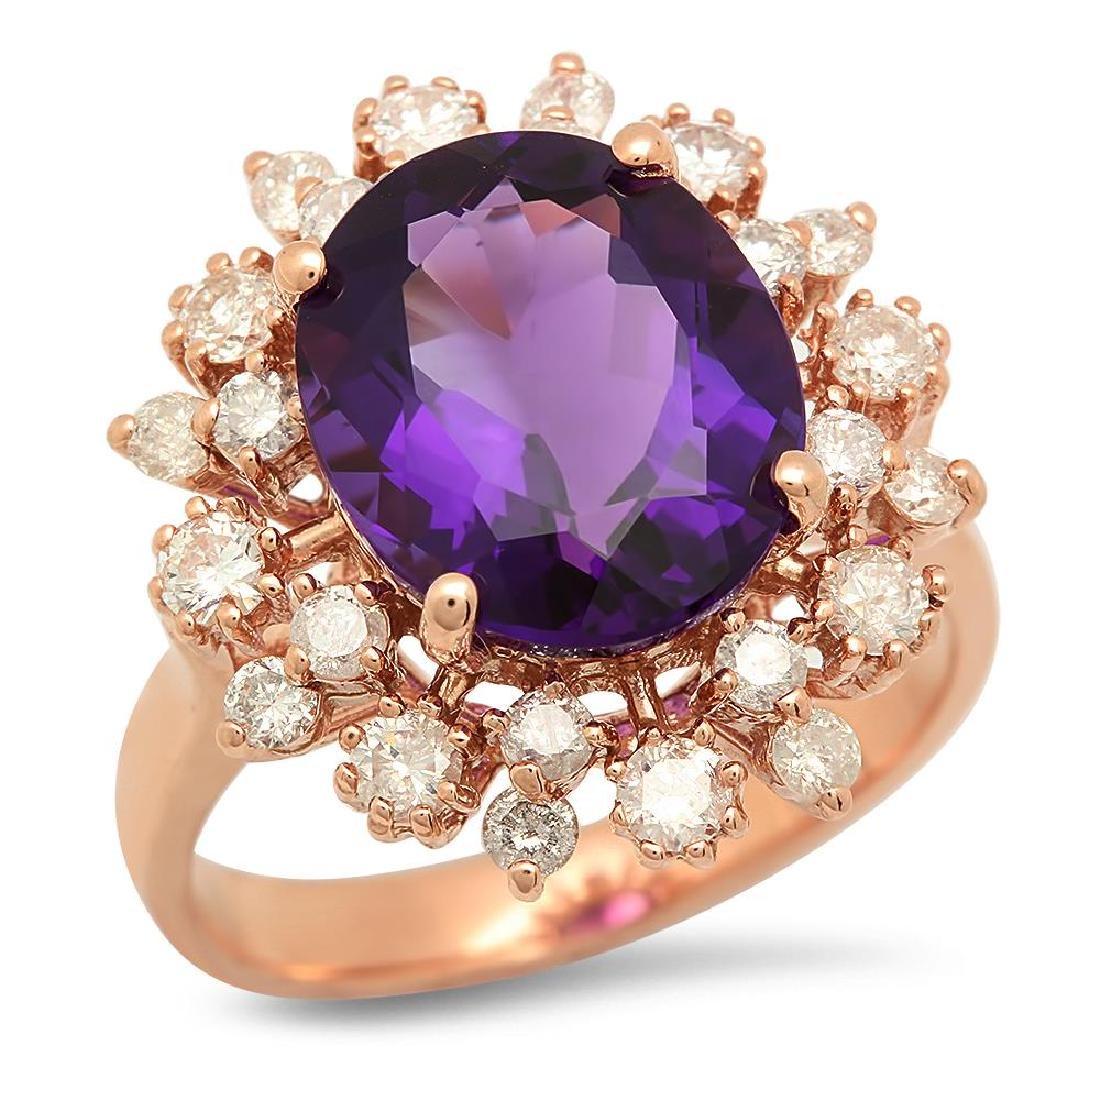 14K Gold 4.54ct Amethyst 1.01cts Diamond Ring